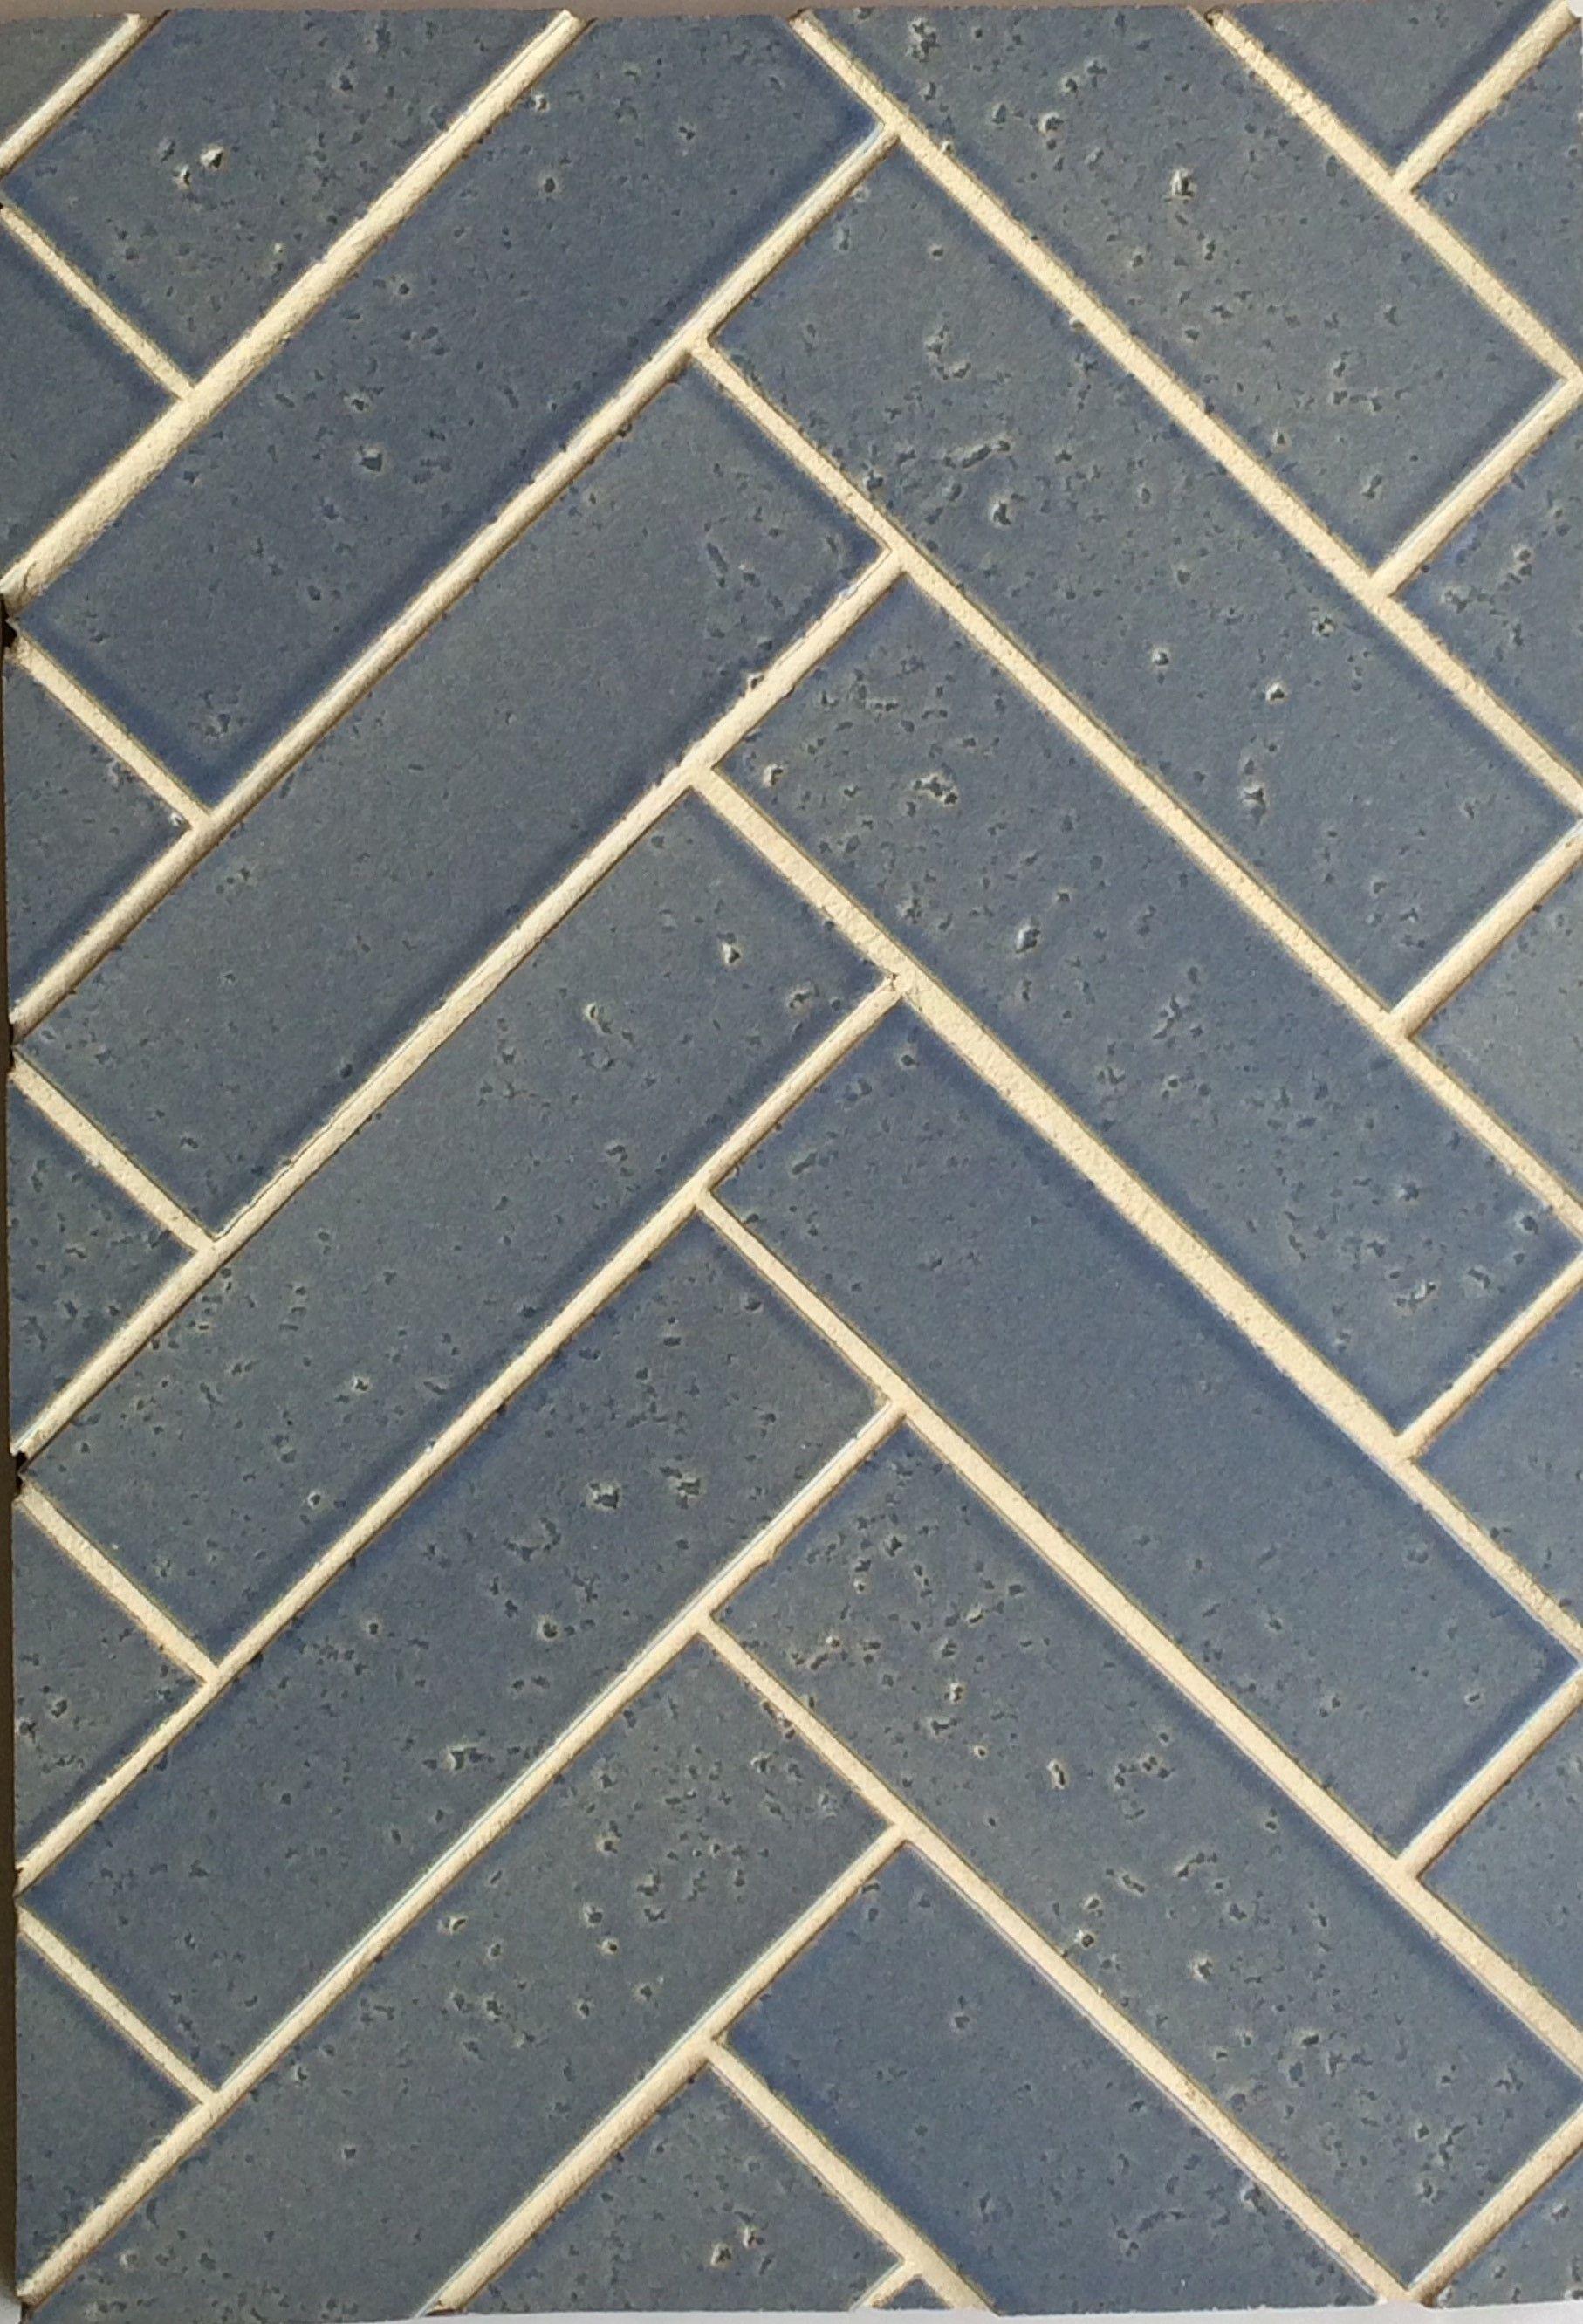 Brick ceramic tiles images tile flooring design ideas boneyard brick trikeenan tileworks handcrafted ceramic tile boneyard brick trikeenan tileworks handcrafted ceramic tile doublecrazyfo images dailygadgetfo Images